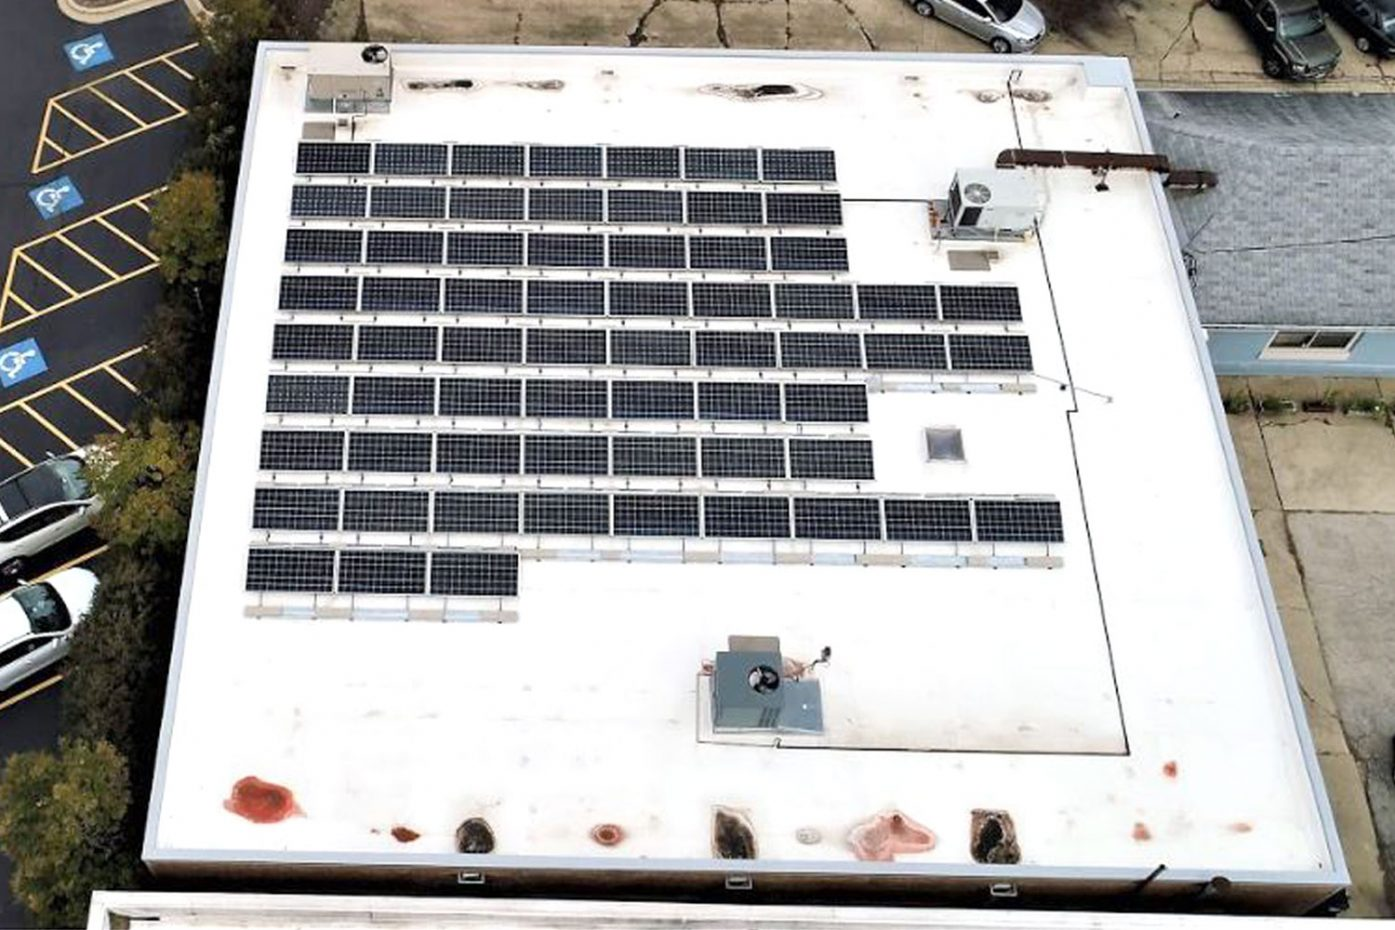 Commercial Solar installation in Geneva, IL - Rethink Electric